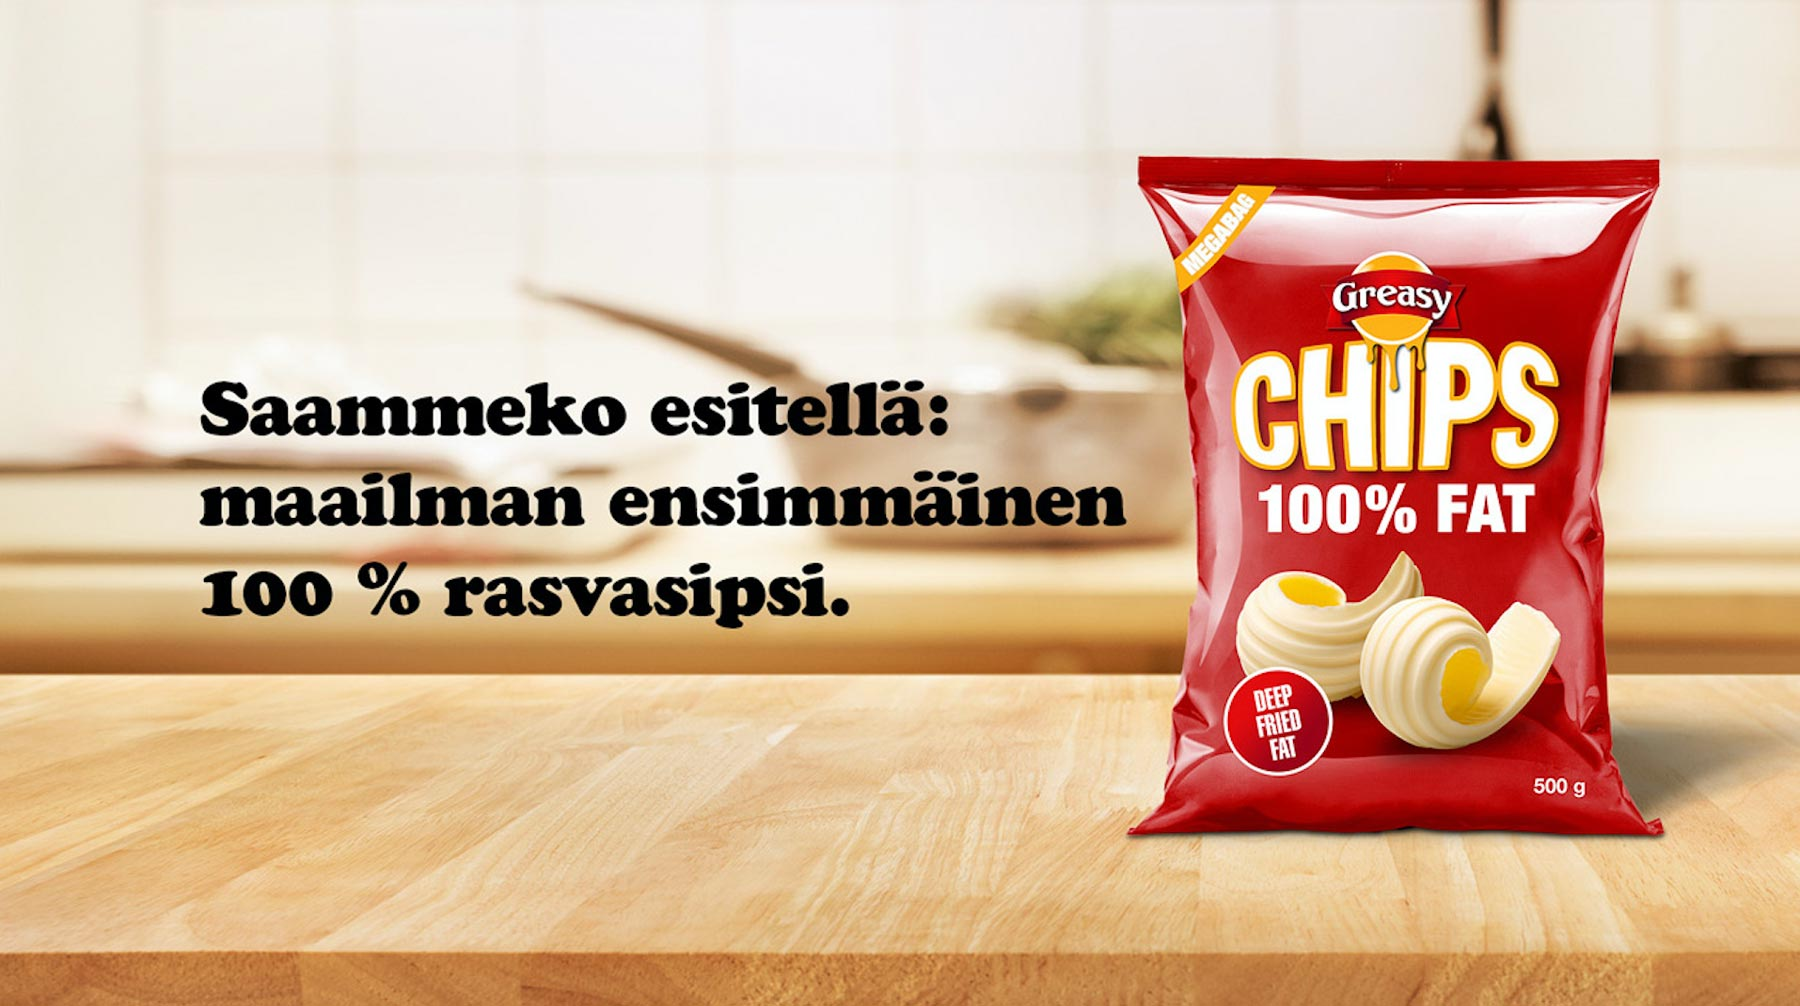 100-fat-crisps-by-framme